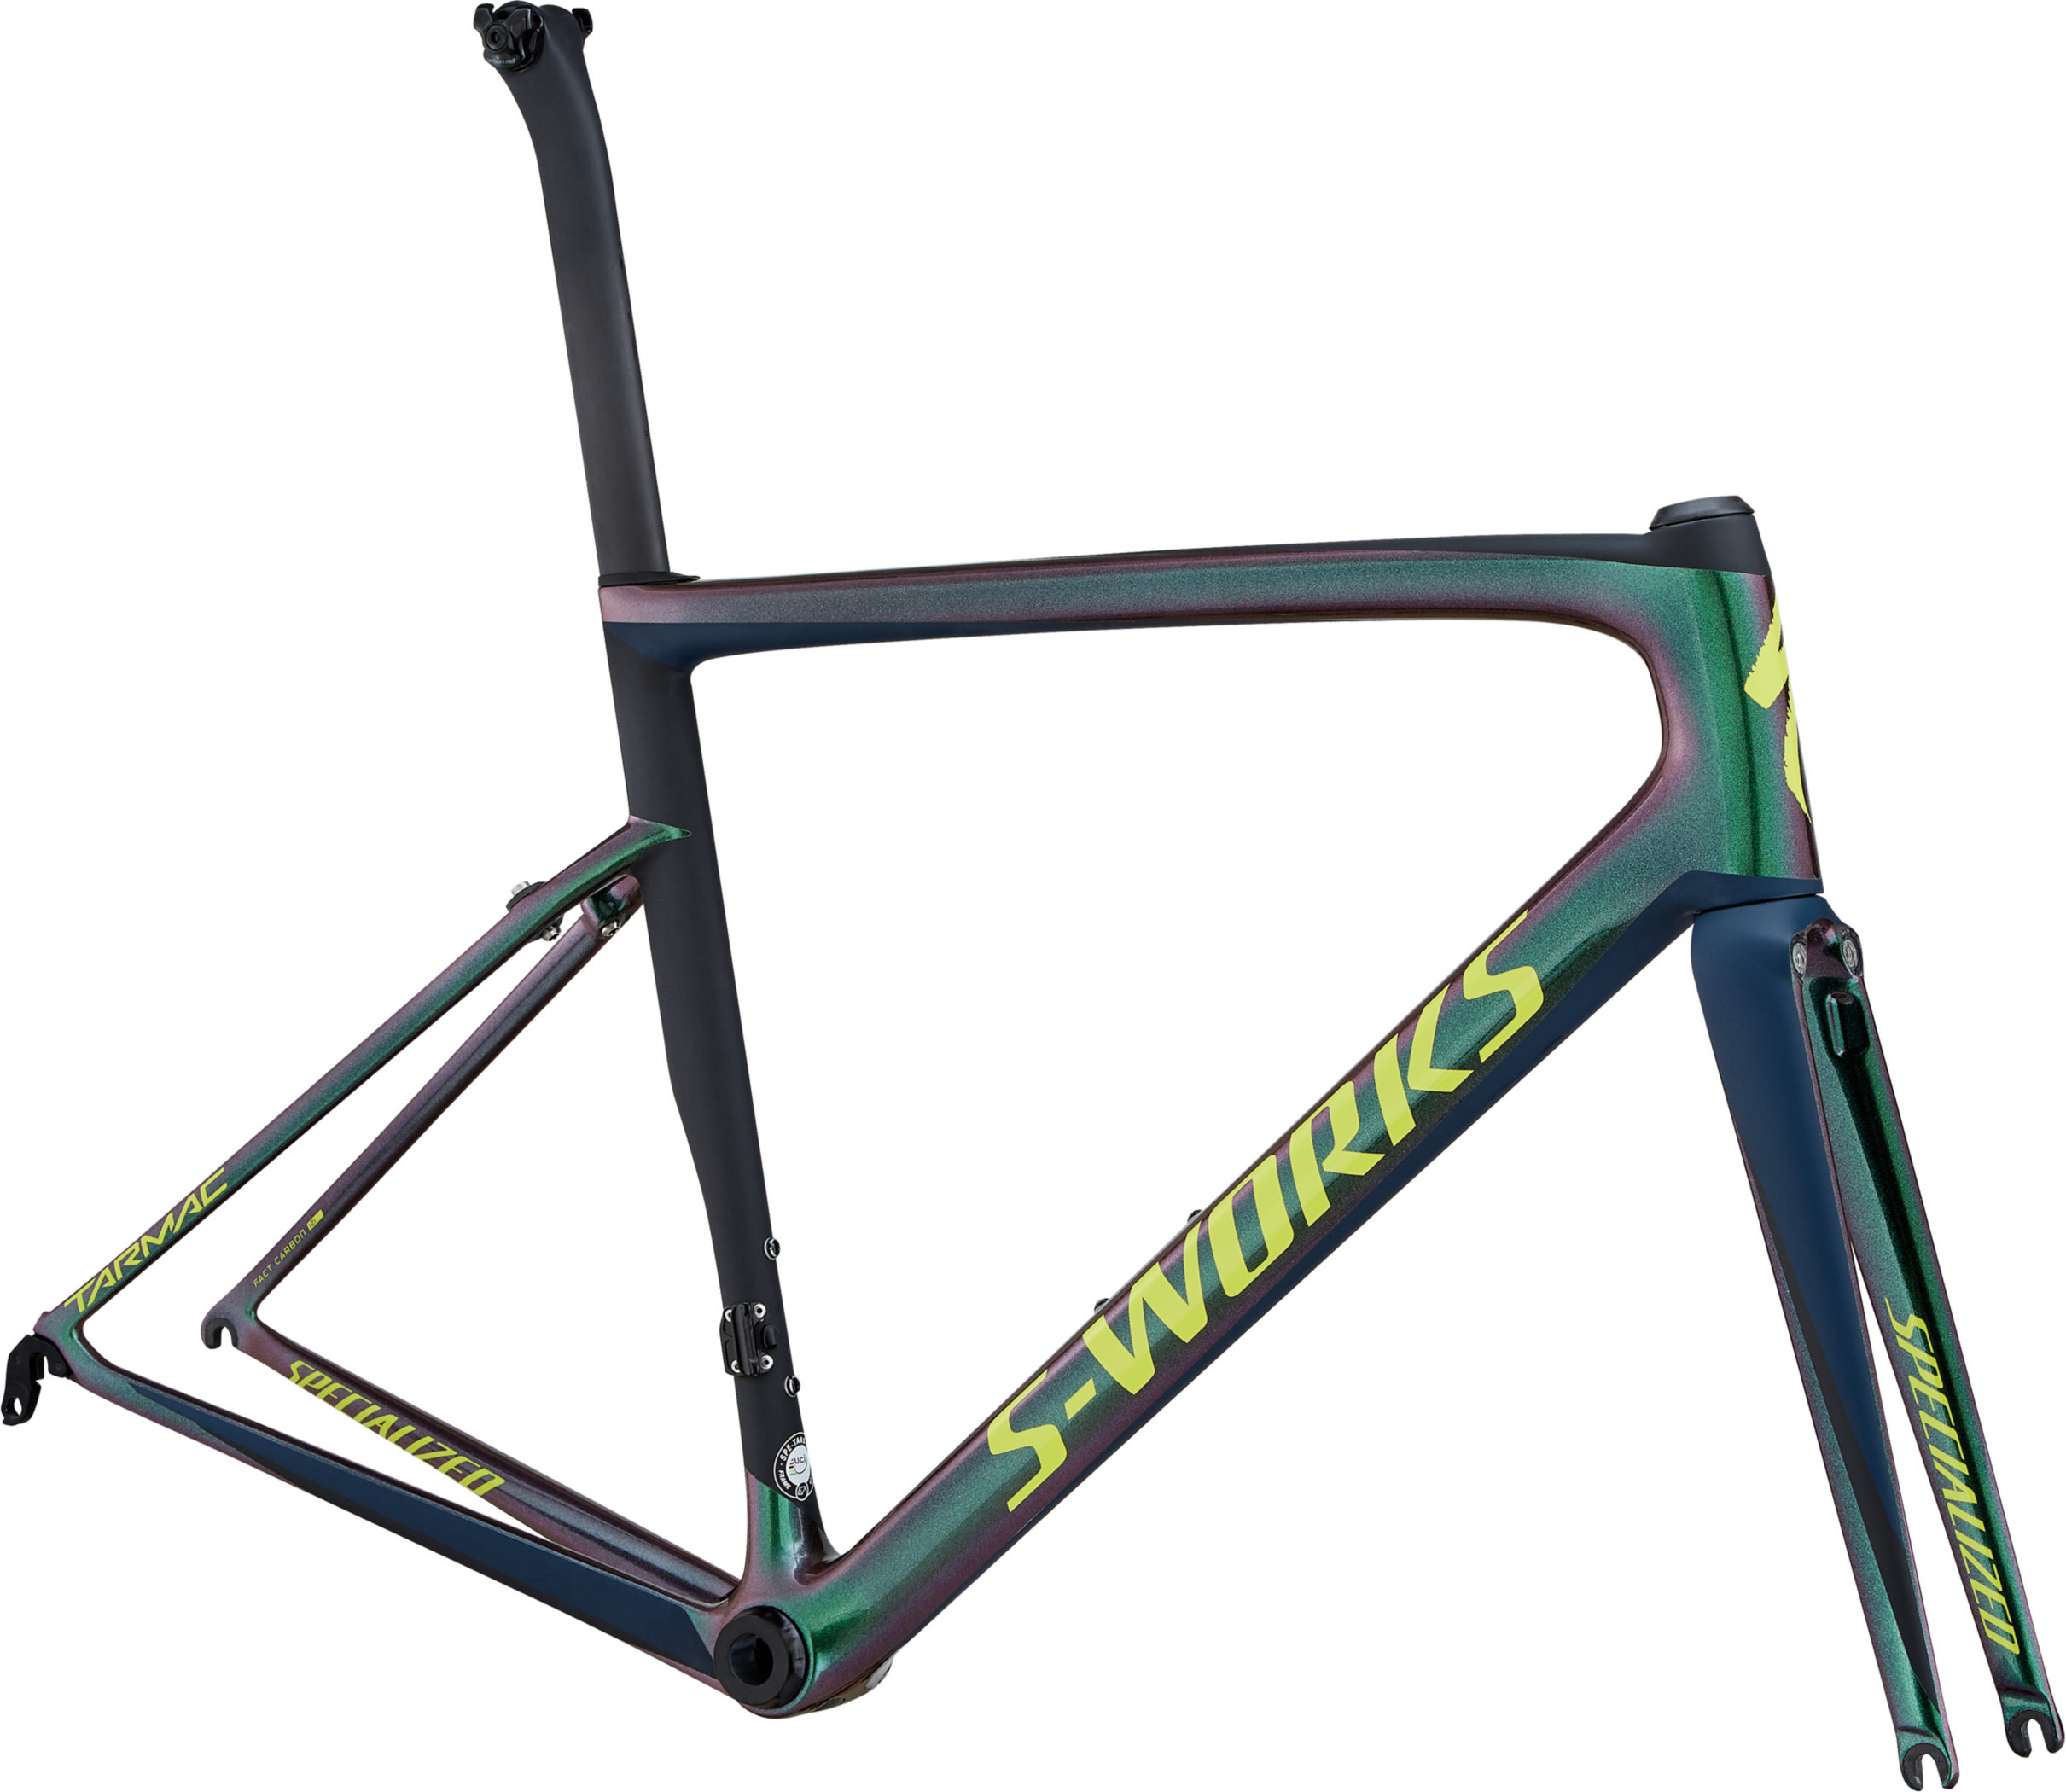 Specialized Men´s S-Works Tarmac Frameset Chameleon Green/Satin Cast Blue/Black/Team Yellow 56 - Alpha Bikes